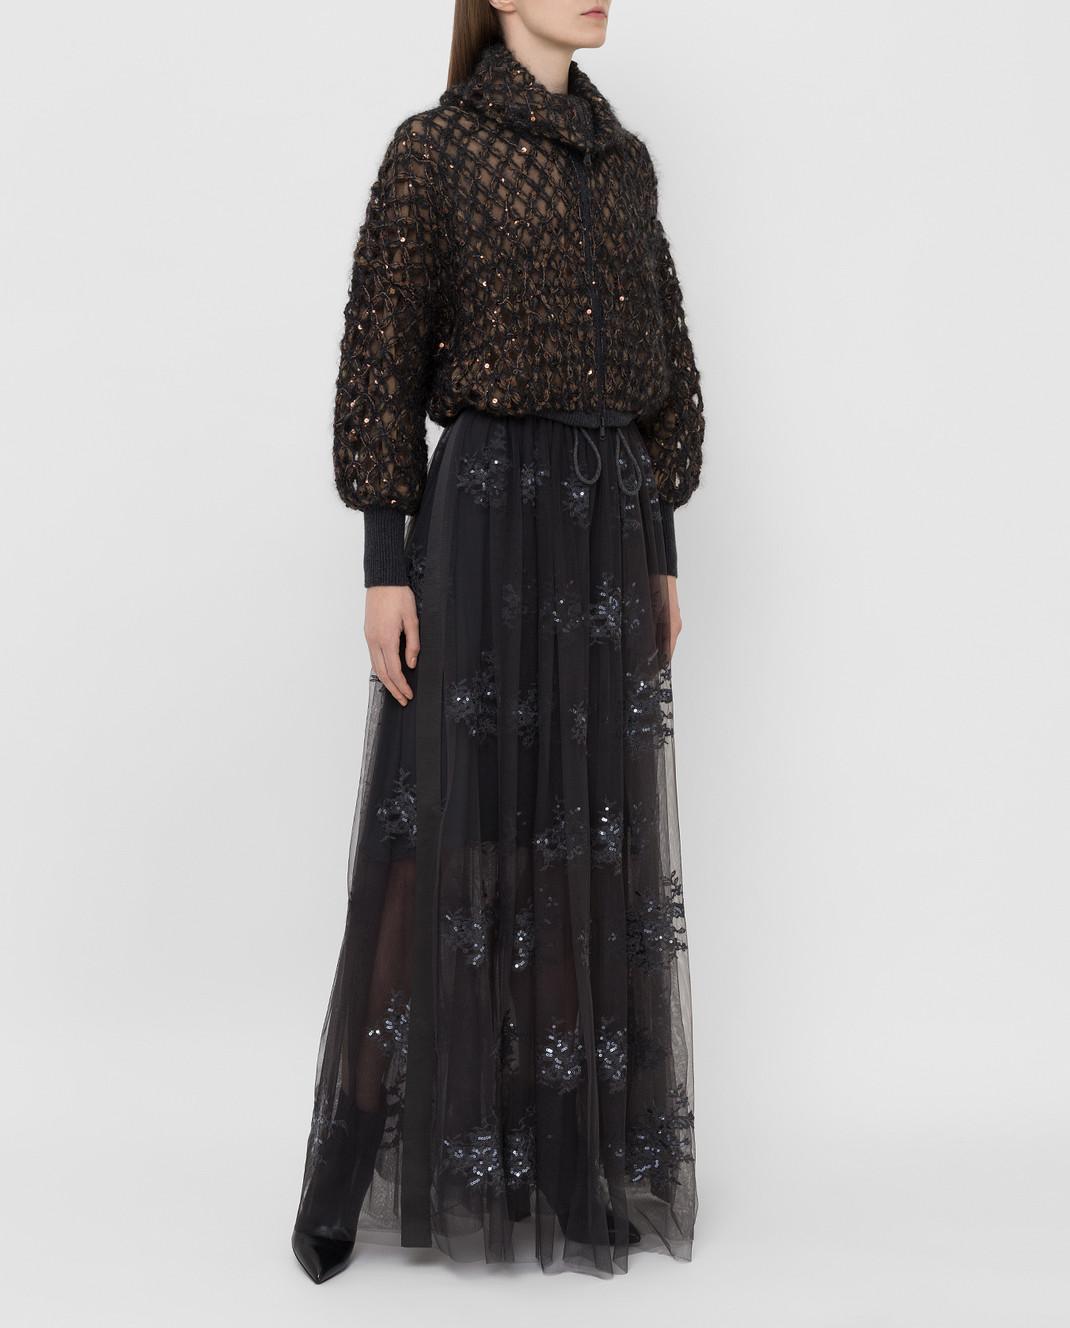 Brunello Cucinelli Темно-серая юбка MA960G2739 изображение 2